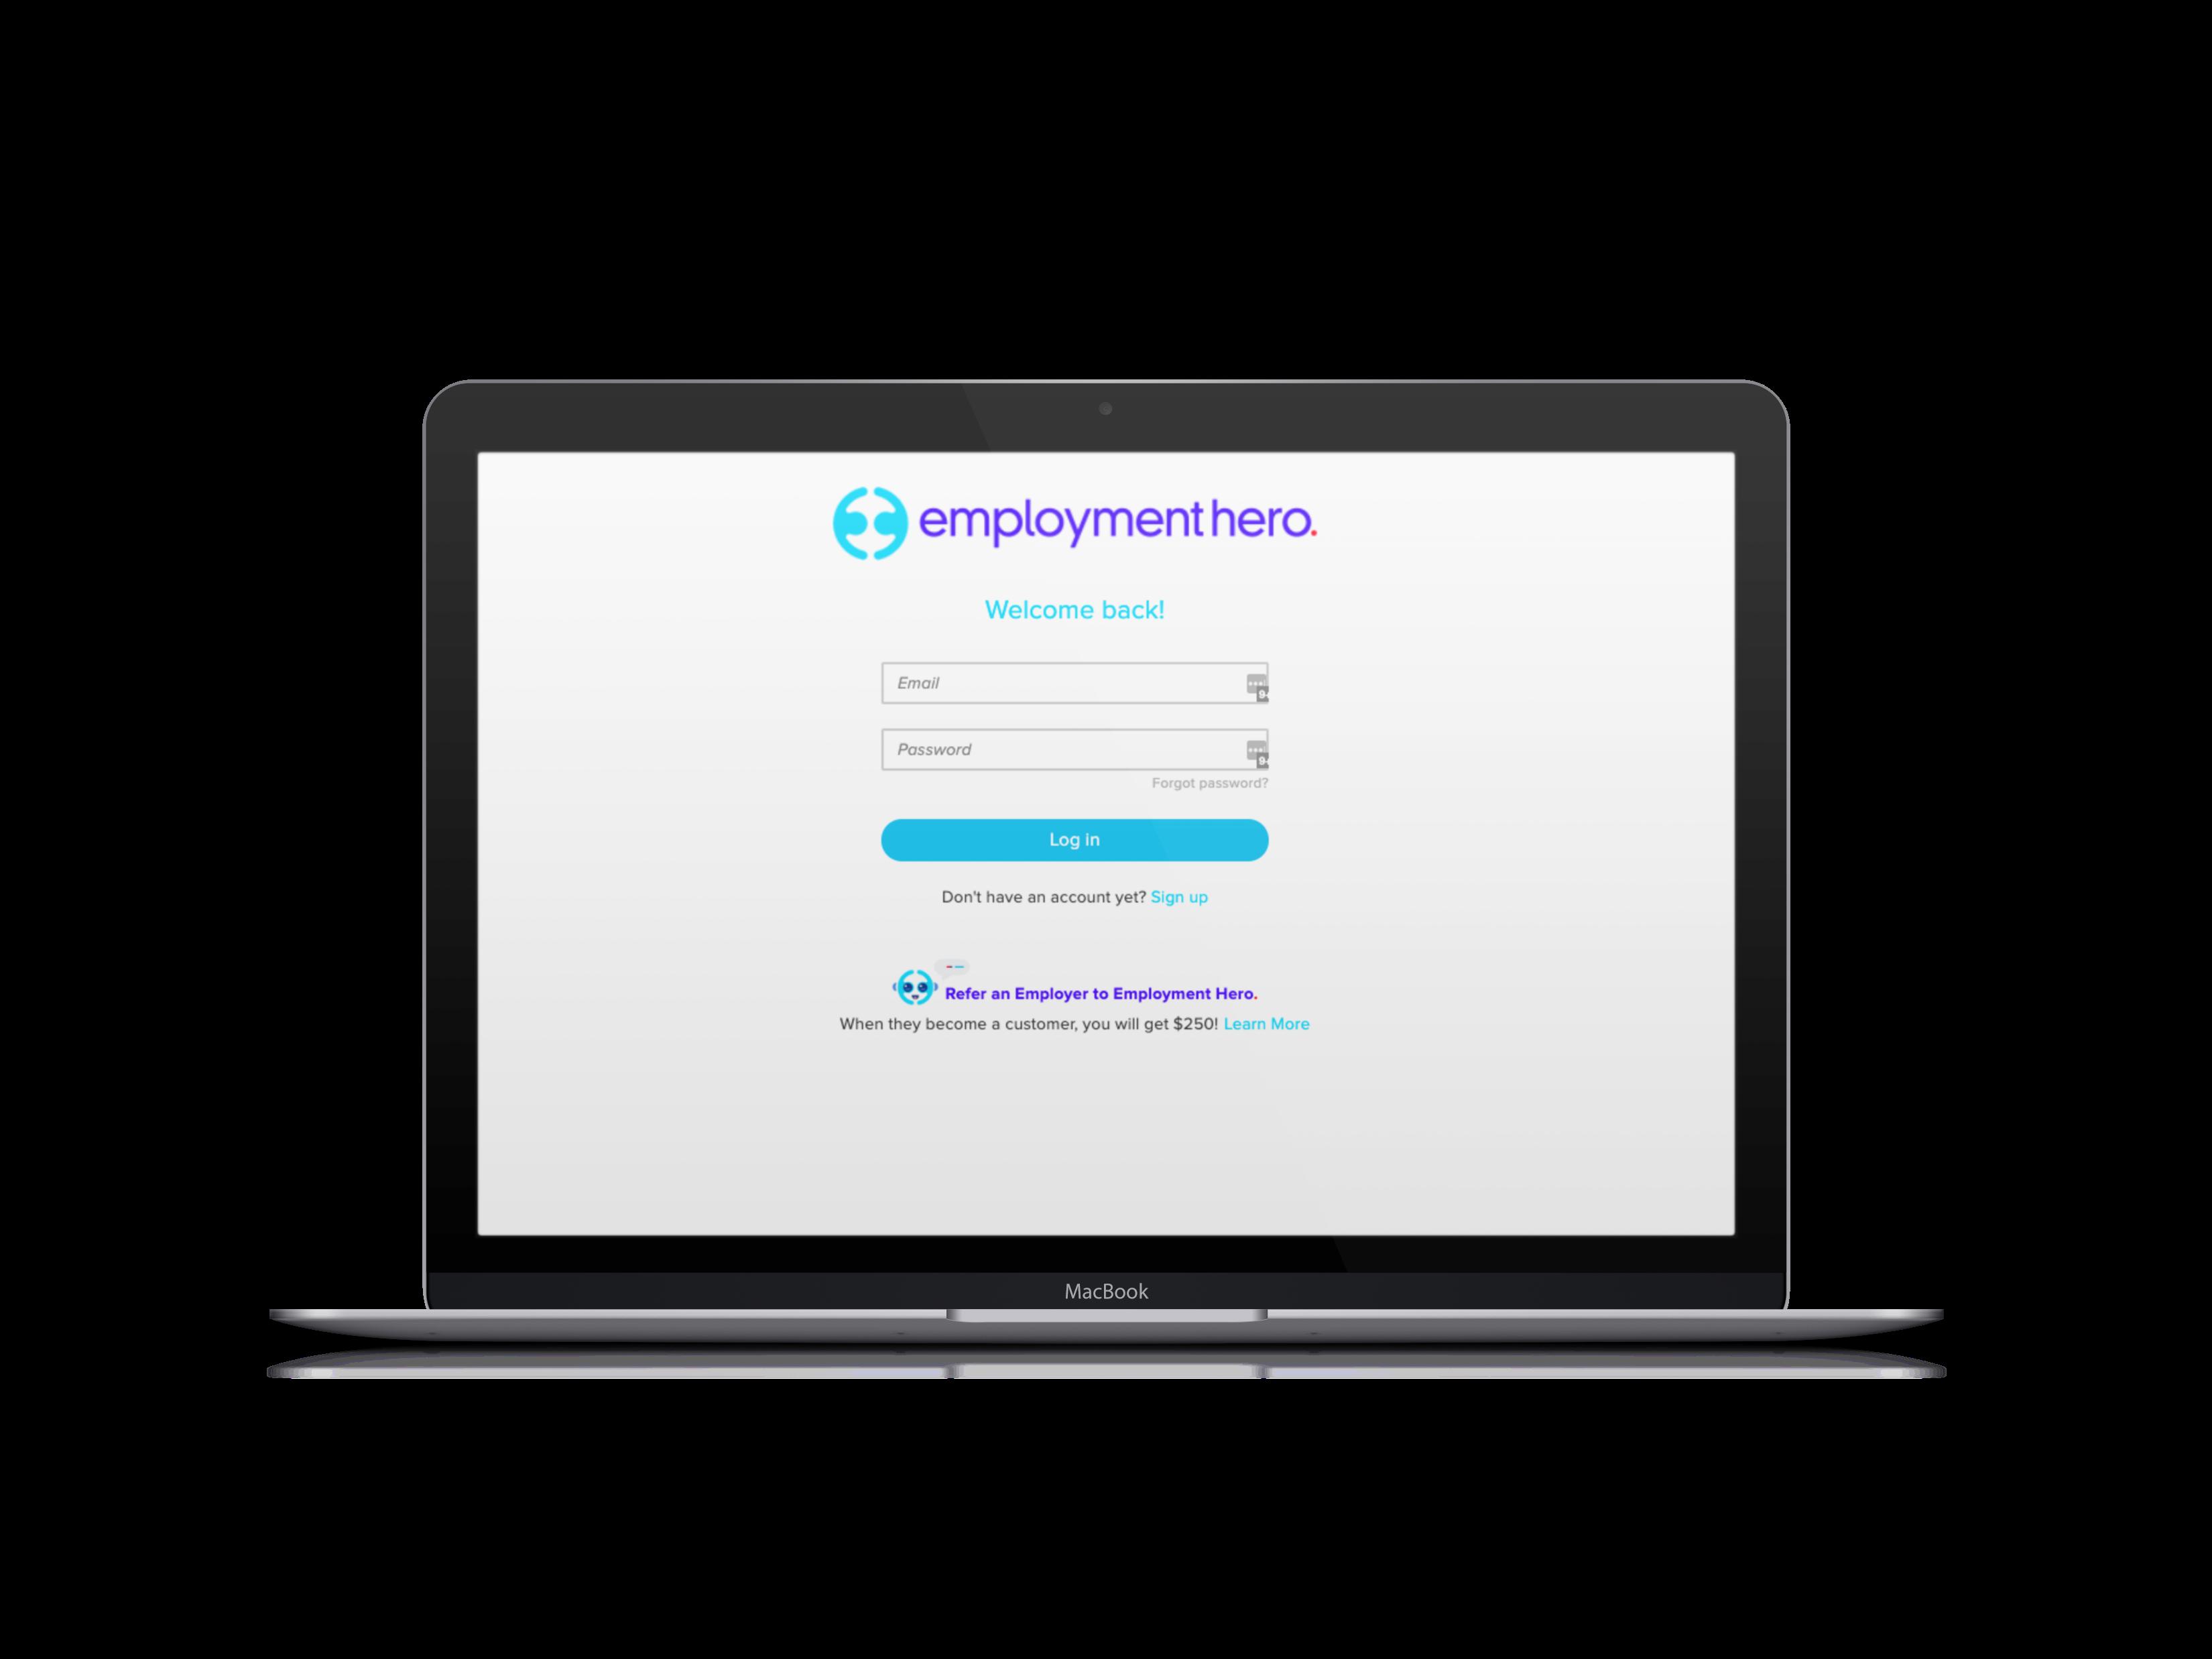 Employment Hero Software - Employment Hero Login